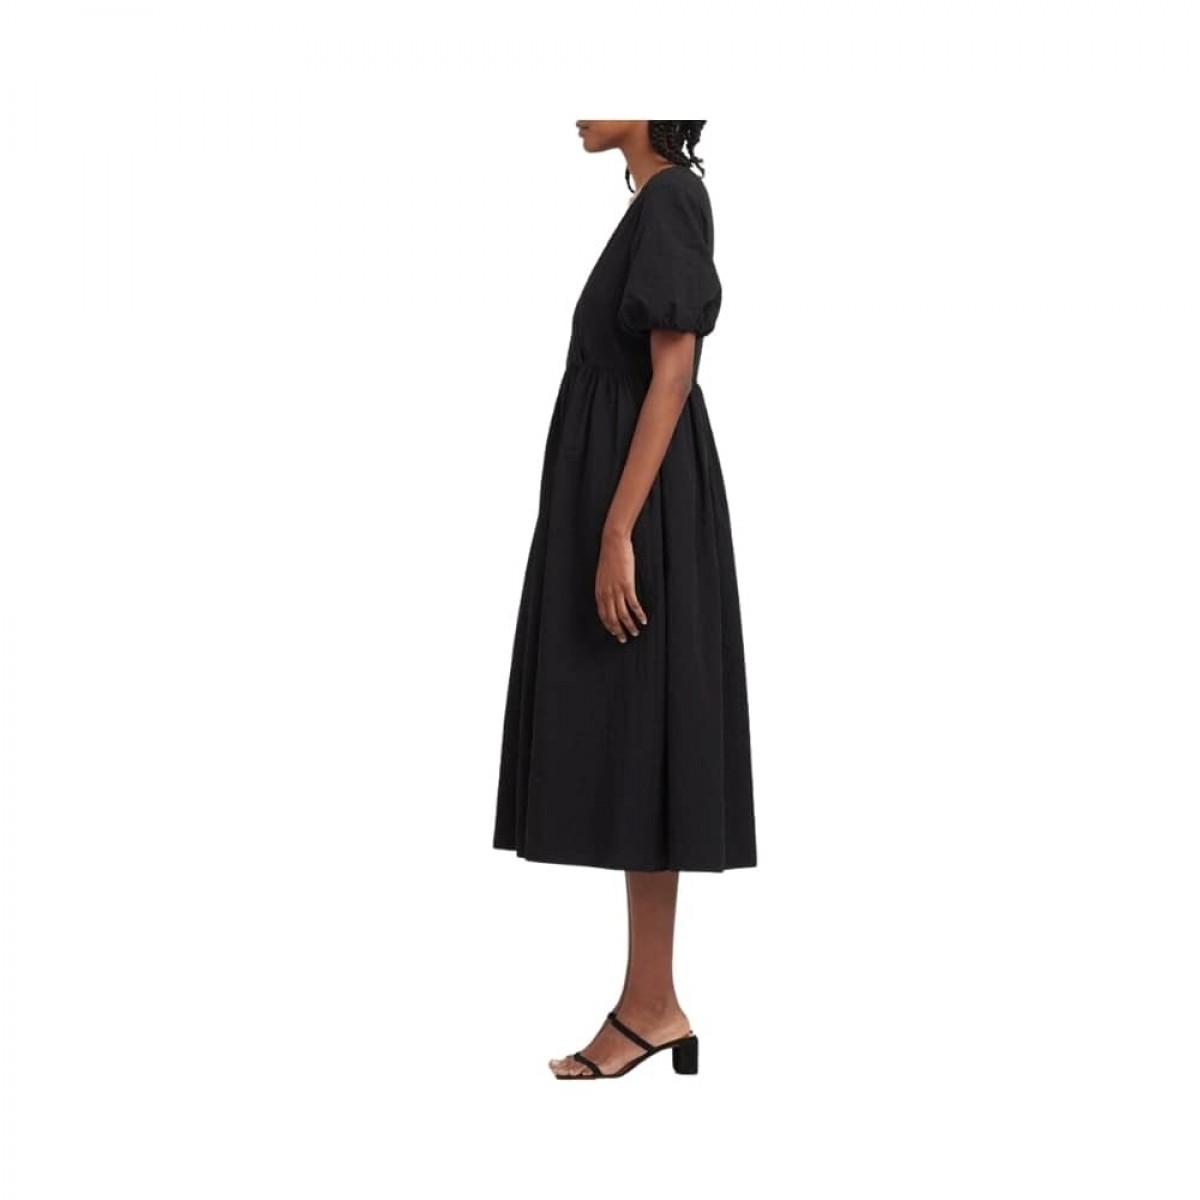 v neck dress with puff sleeves - black - model fra siden